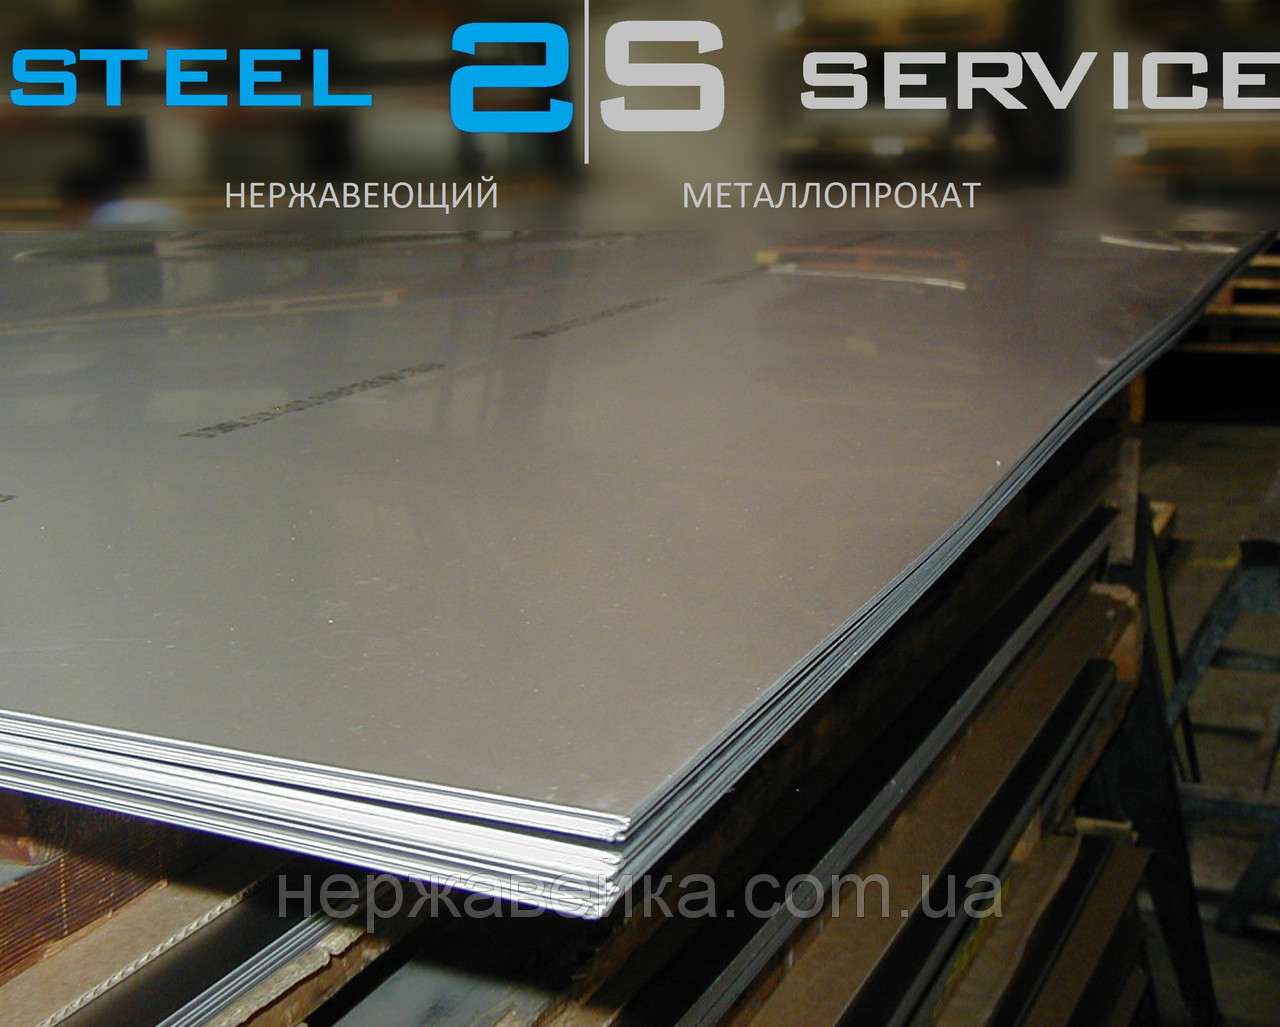 Нержавеющий лист 6х1250х2500мм  AISI 316L(03Х17Н14М3) F1 - горячекатанный,  кислотостойкий